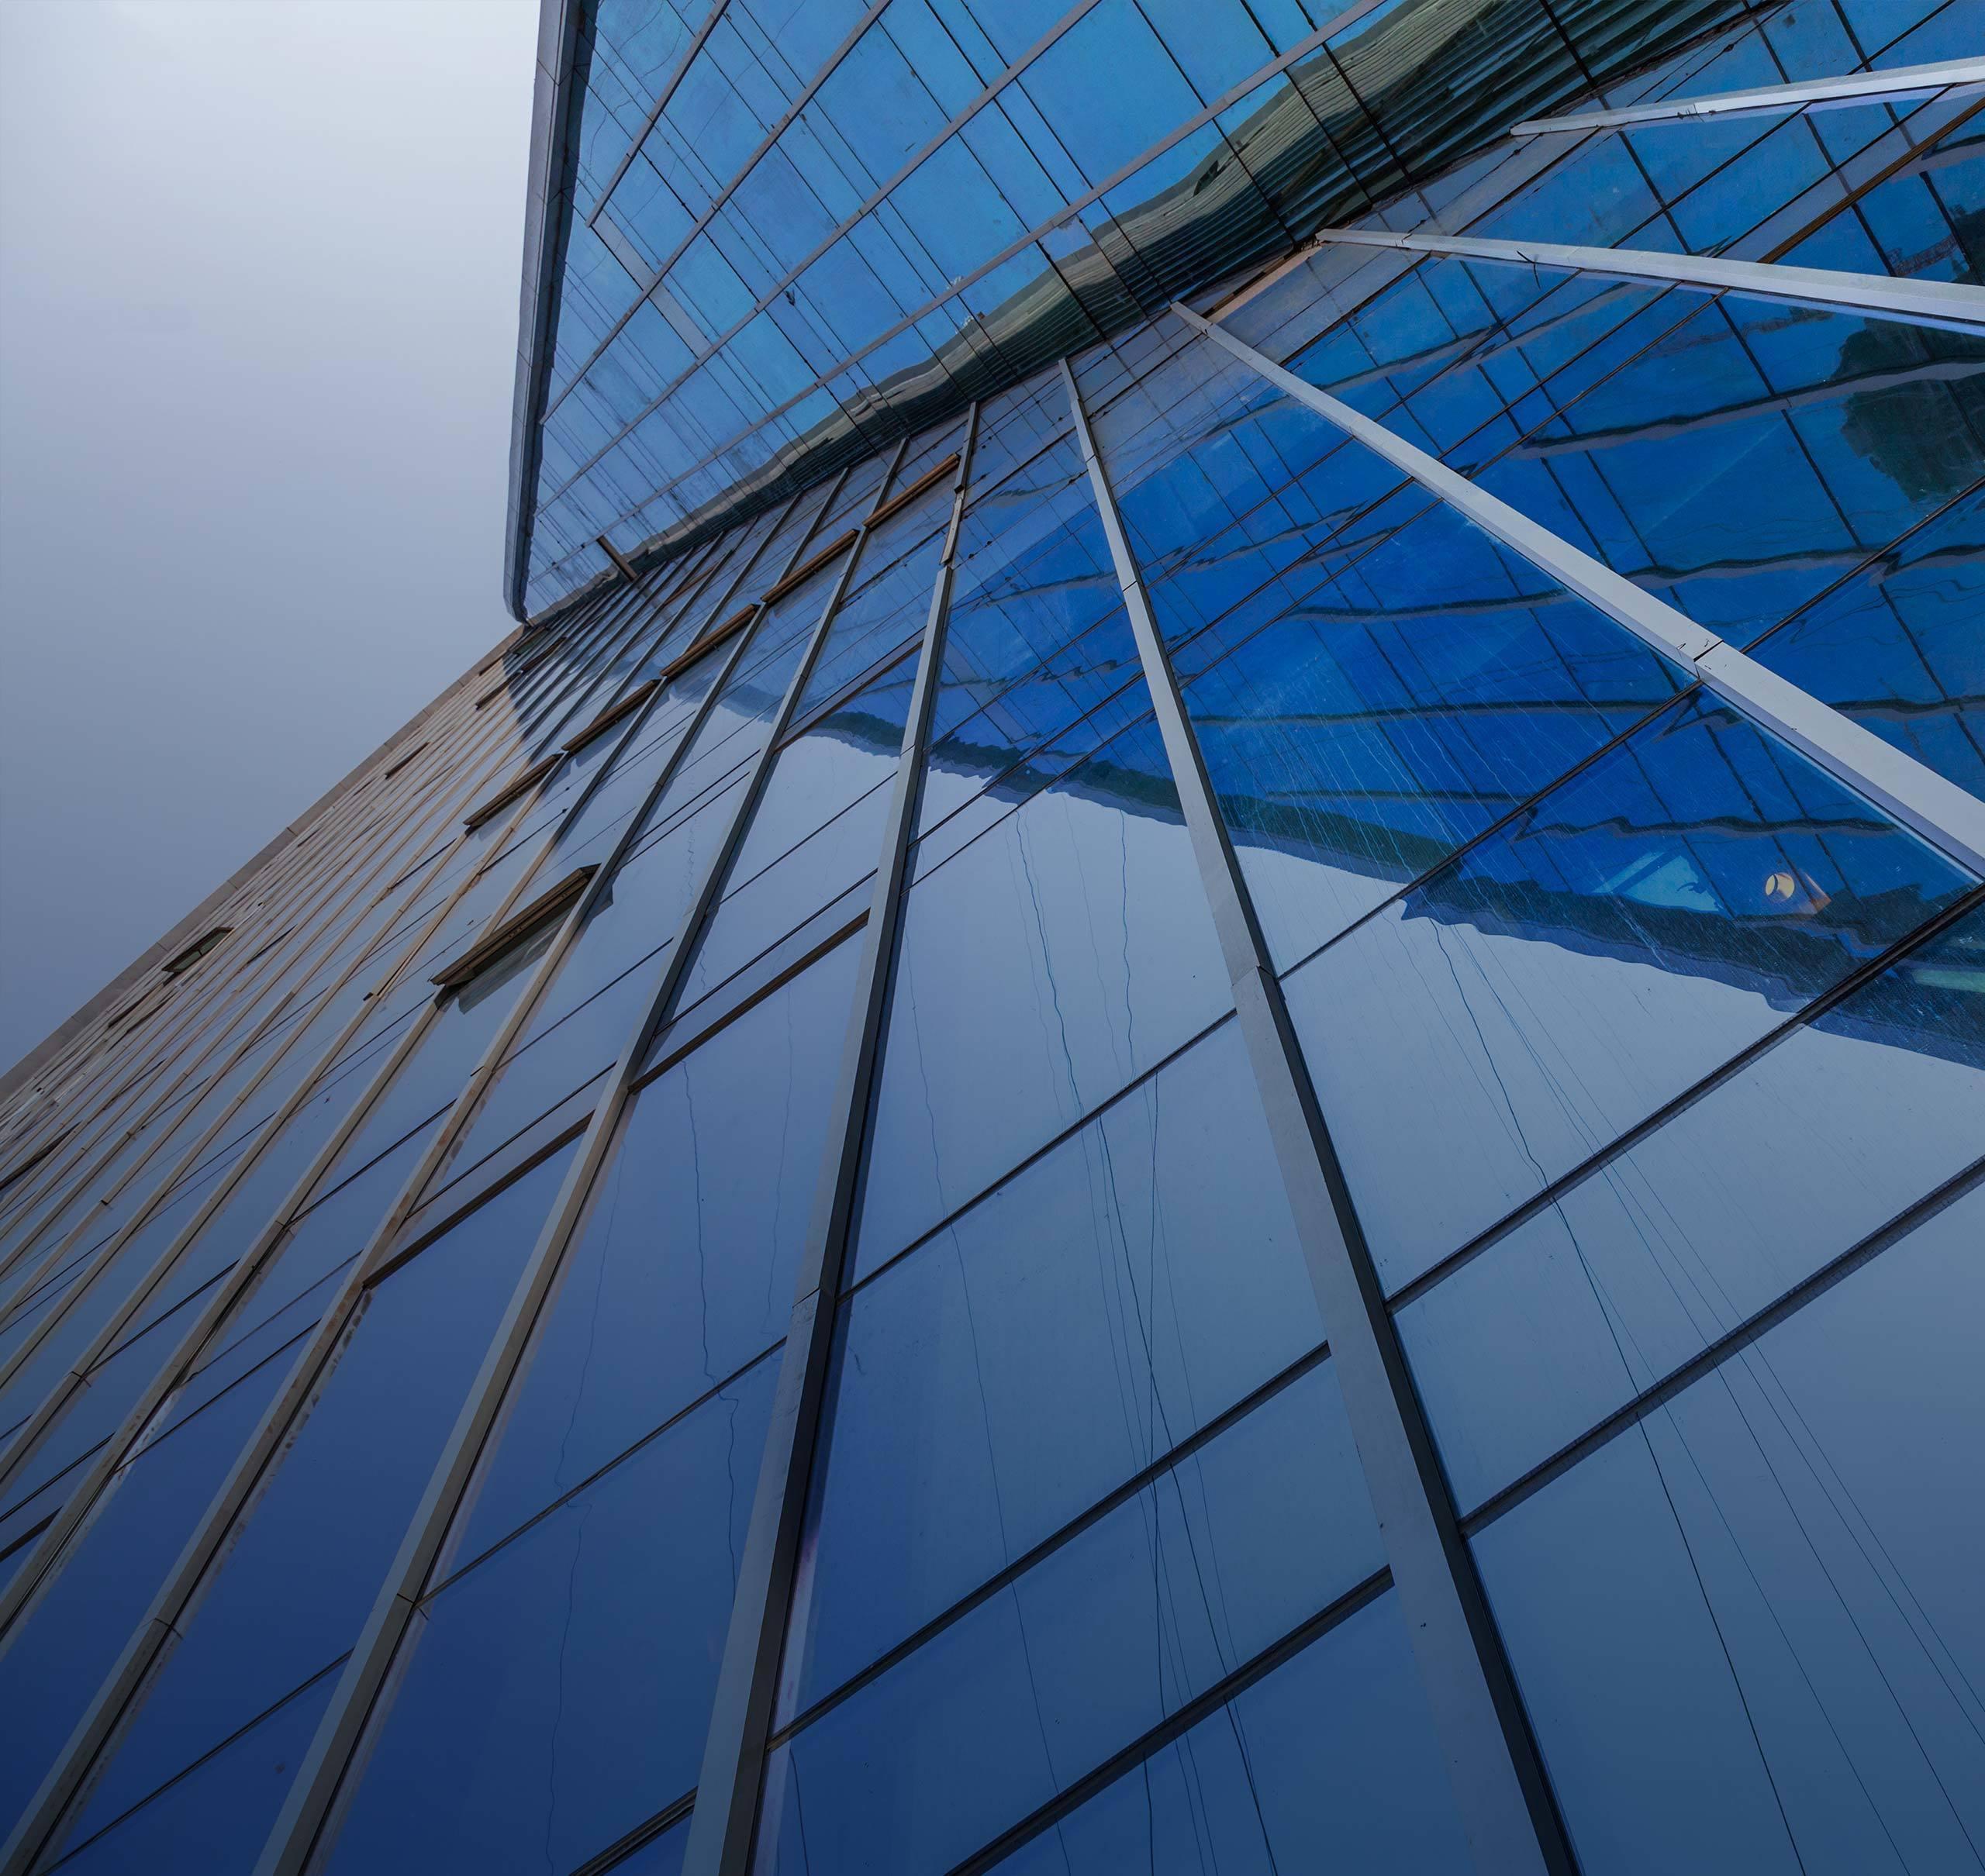 Allen Matkins Lender Law Resources